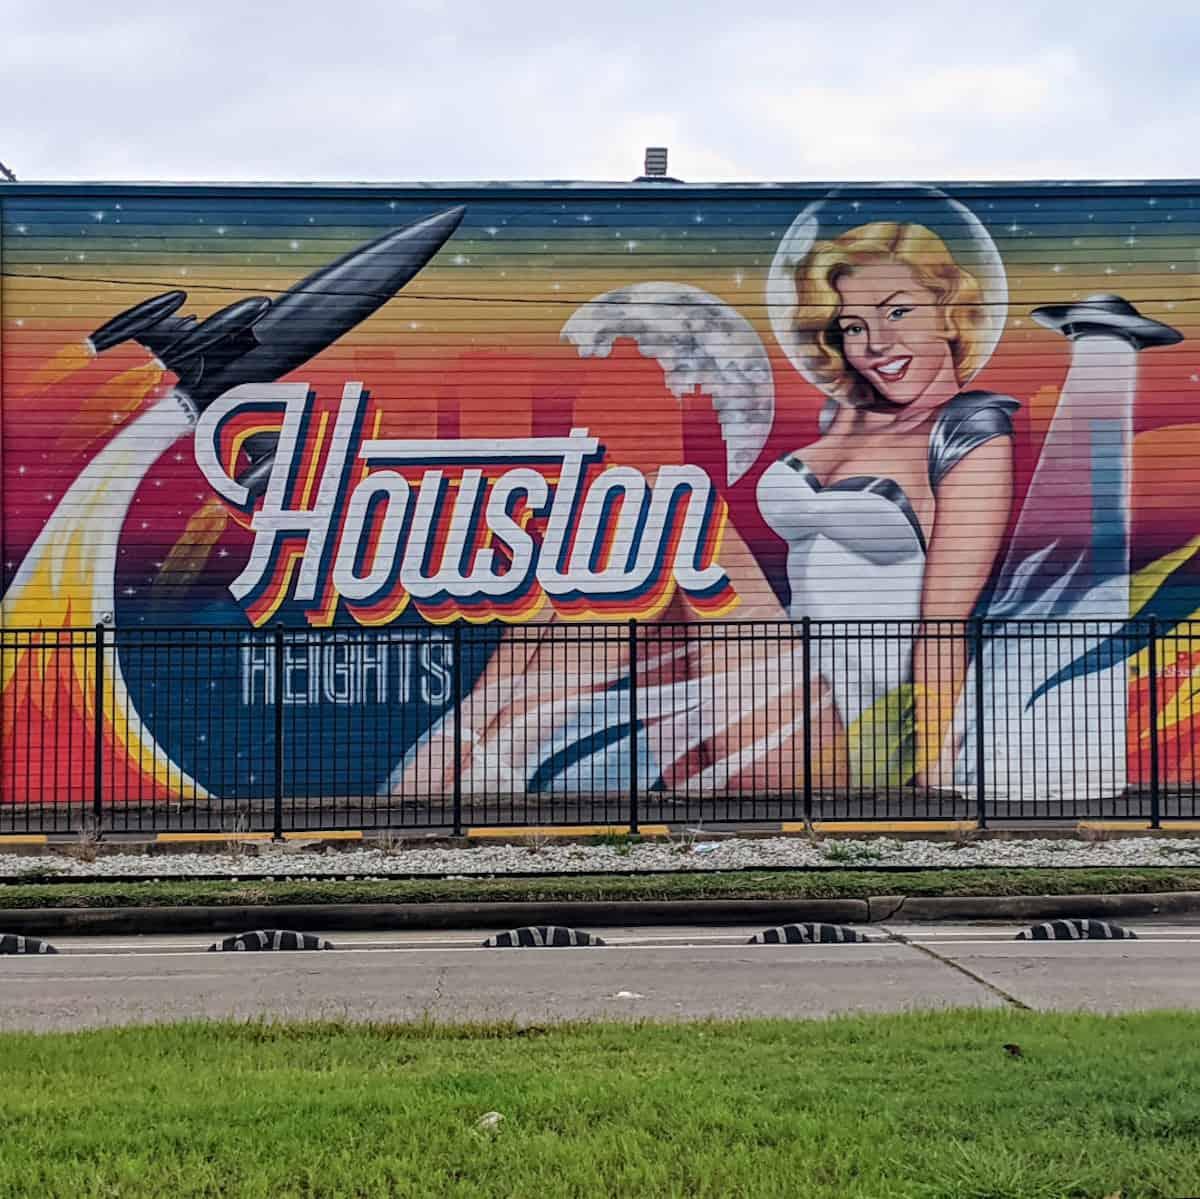 Houston Heights Hotel Mural